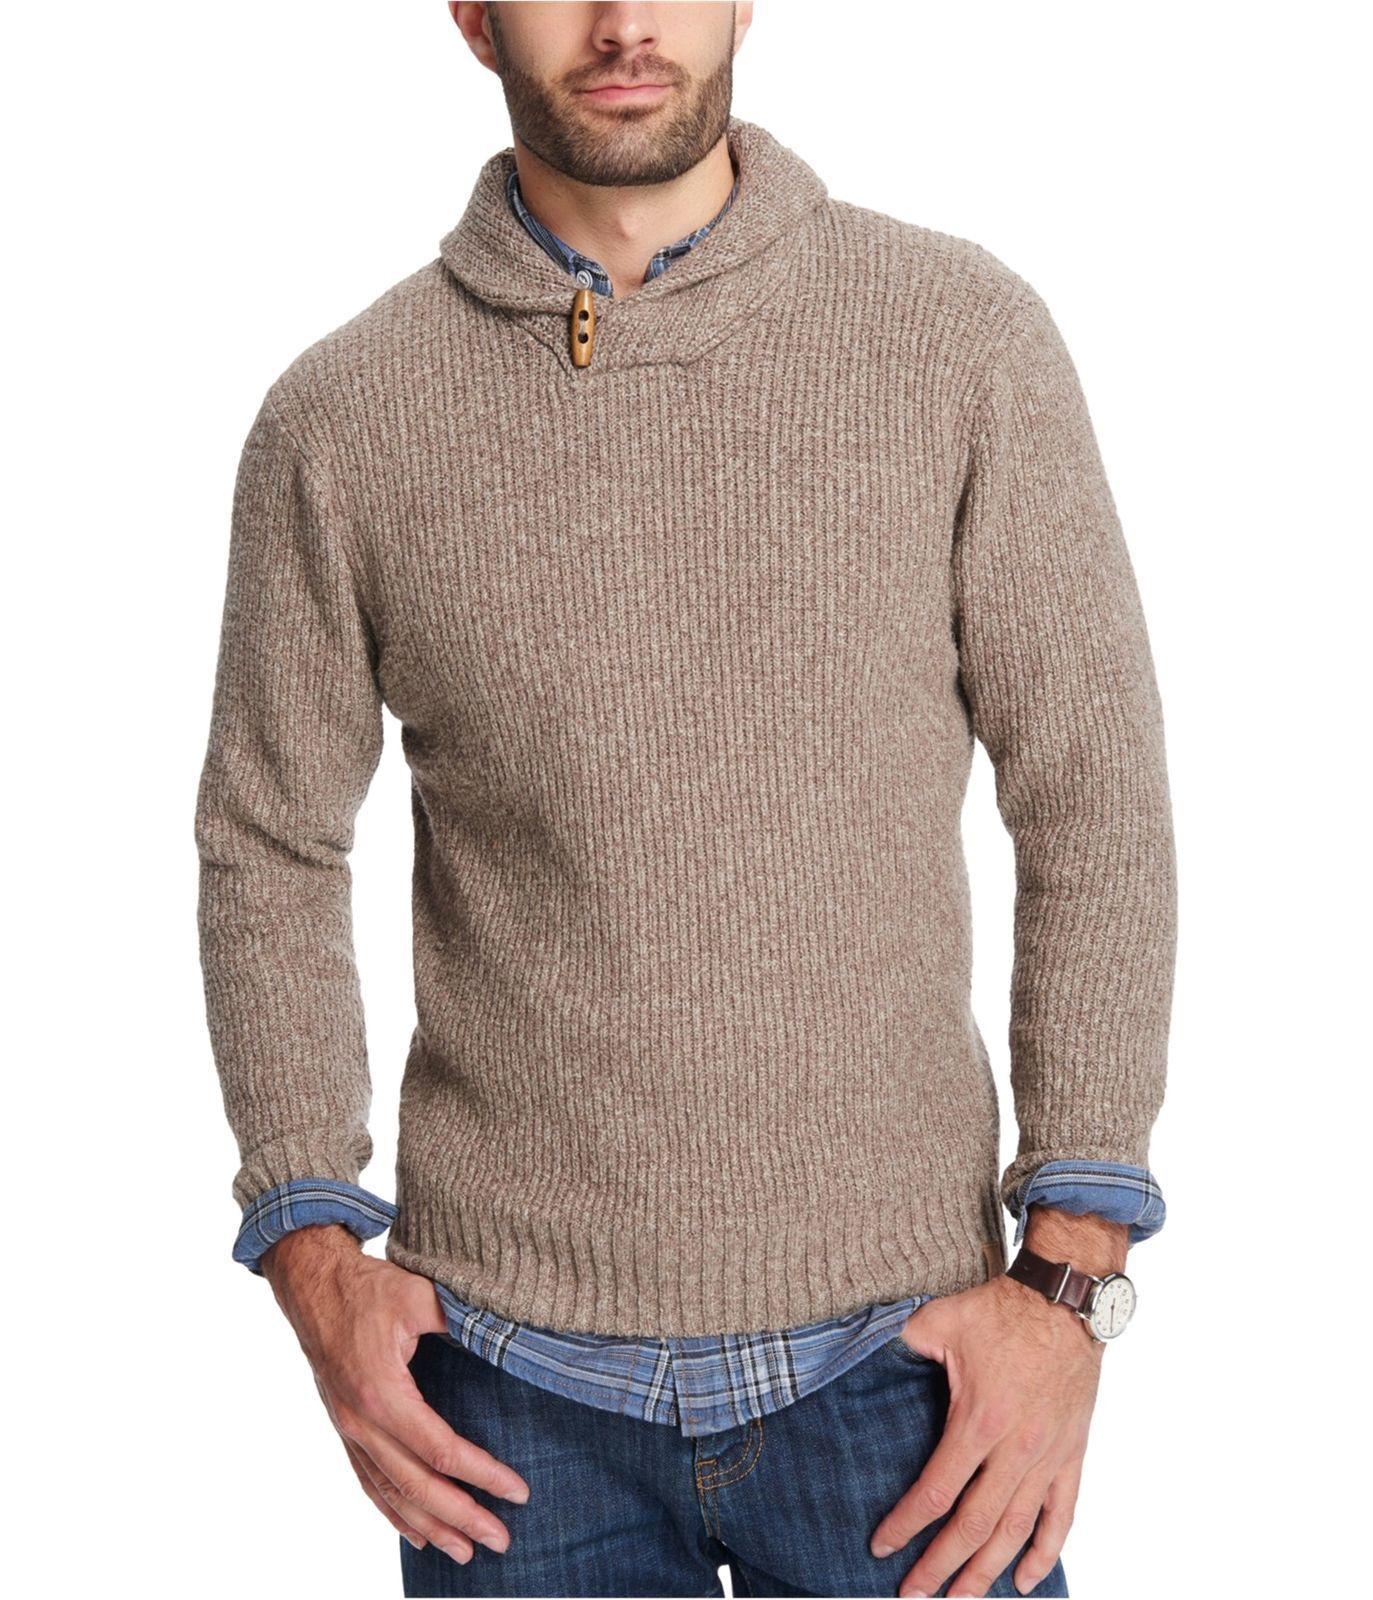 Weatherproof Vintage Men's Shawl Sweater,color  Beige Marl Size  S  , MSRP 80